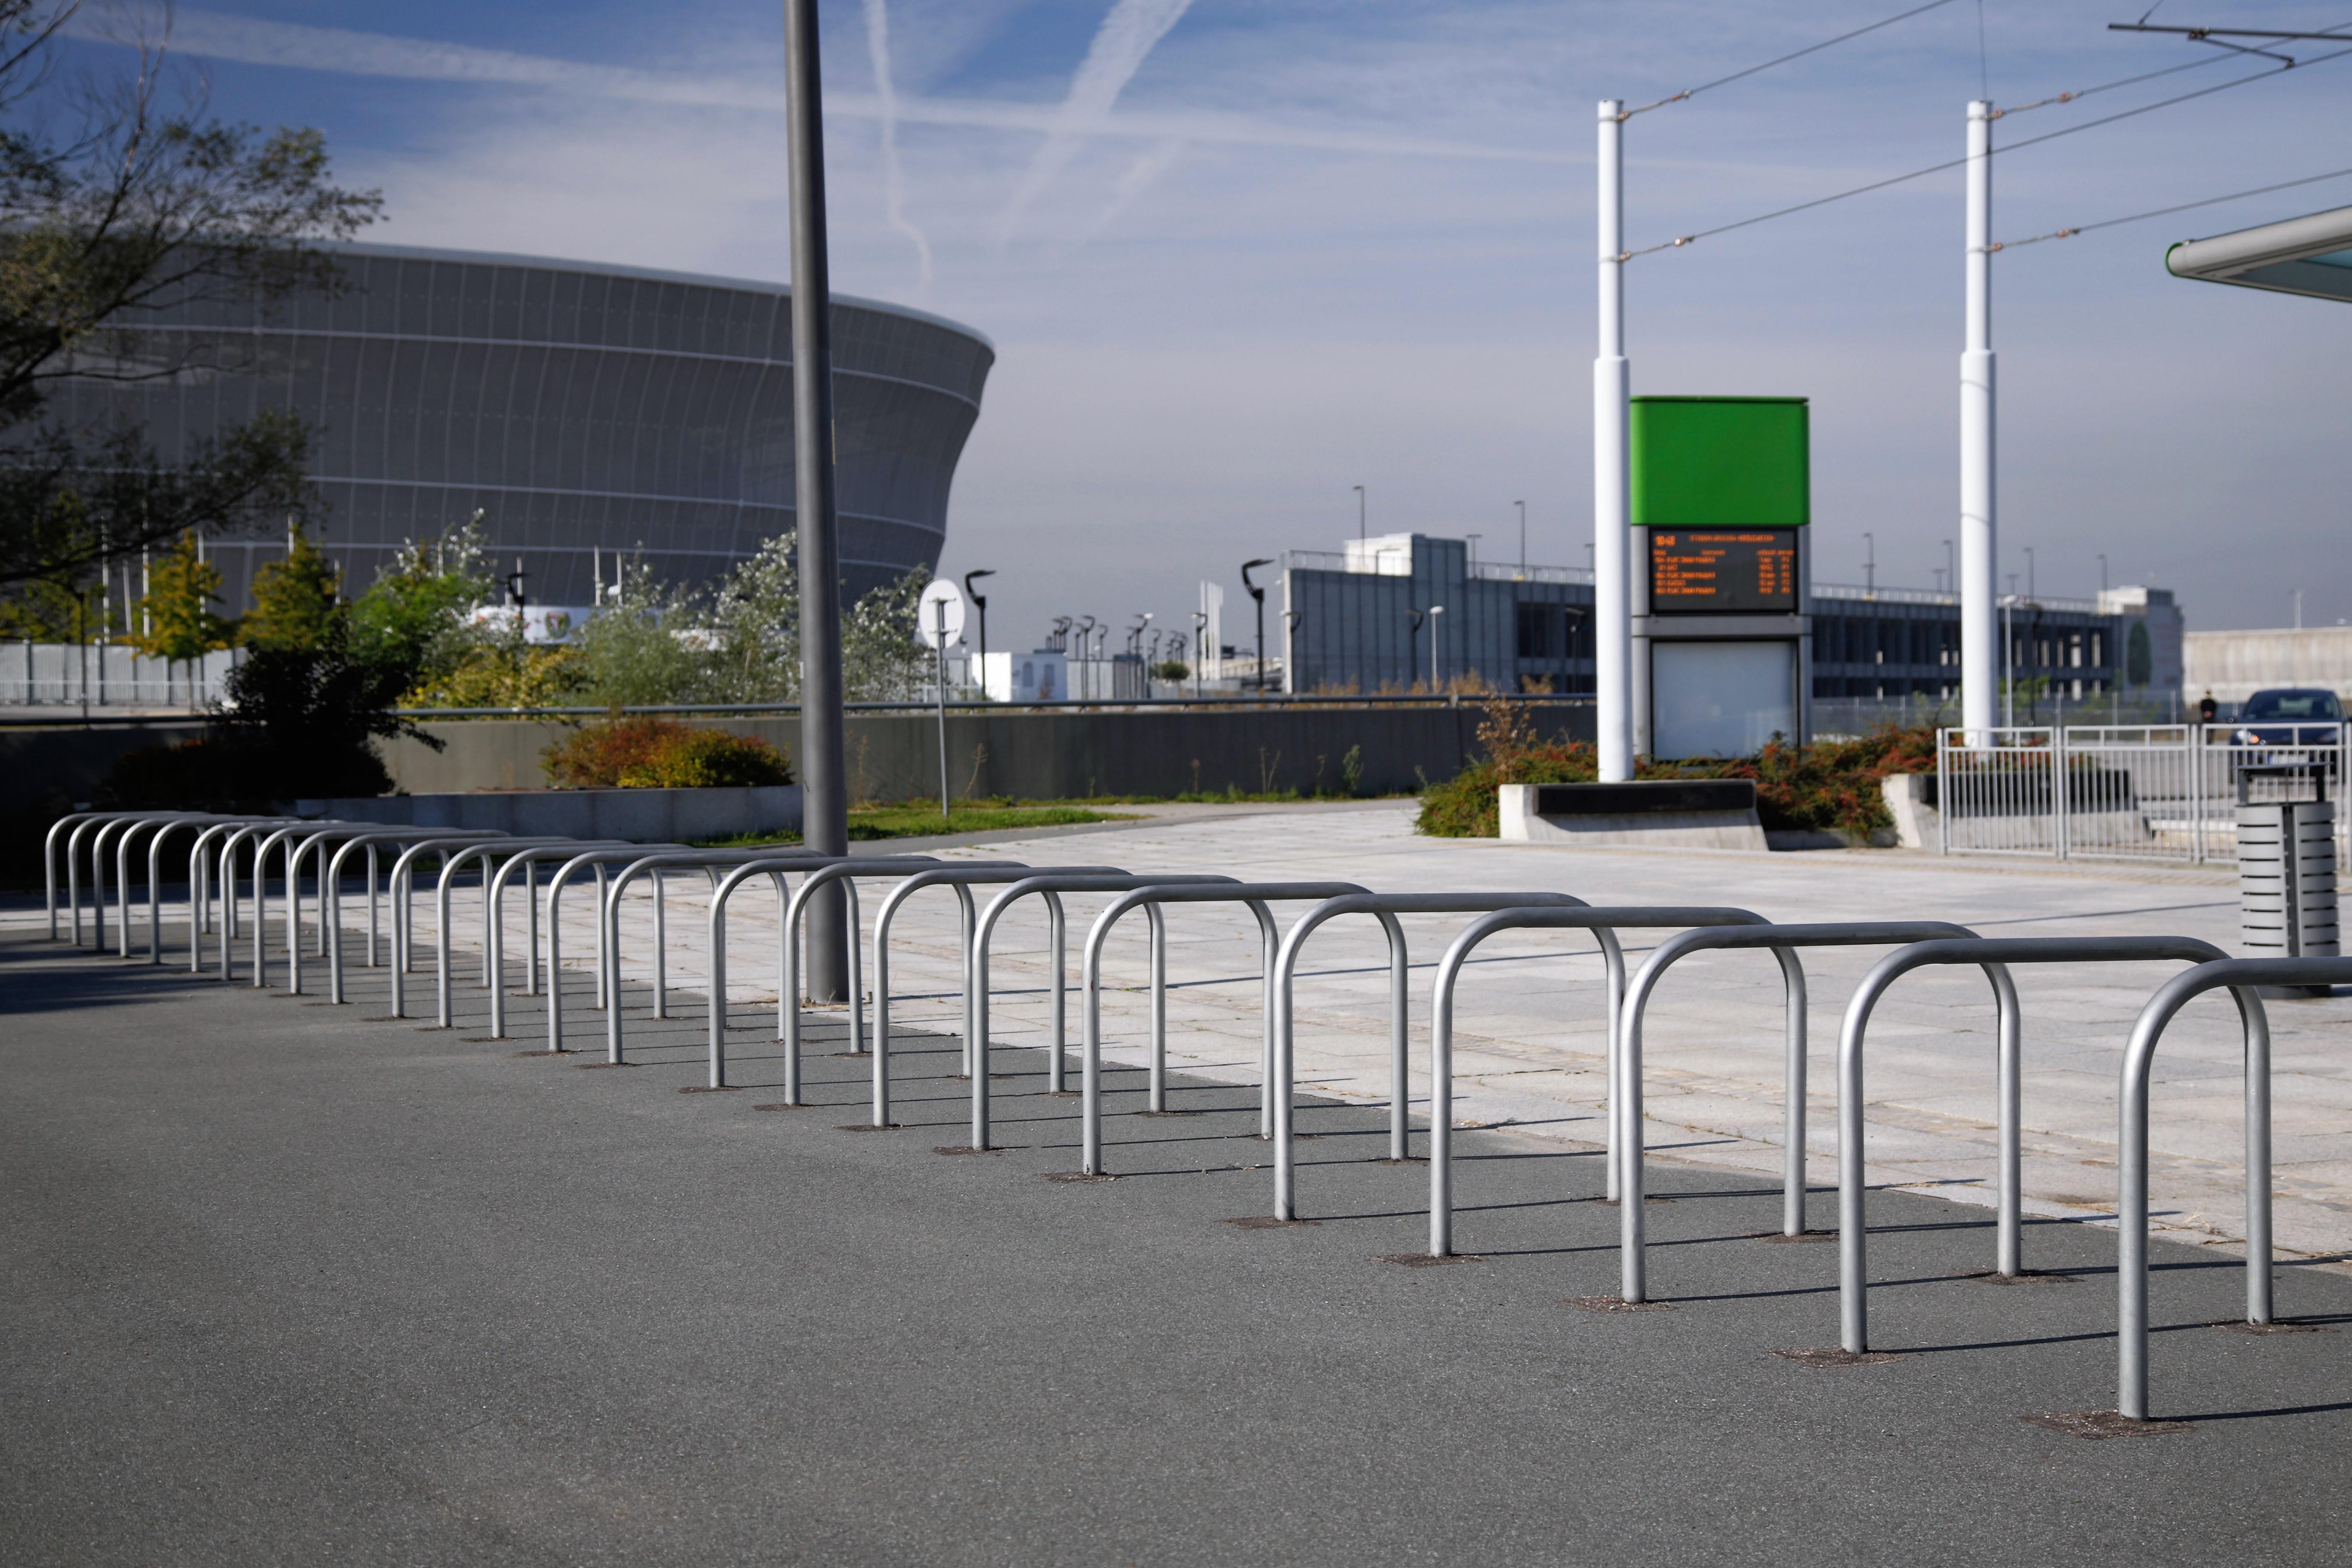 barierki na stadionie